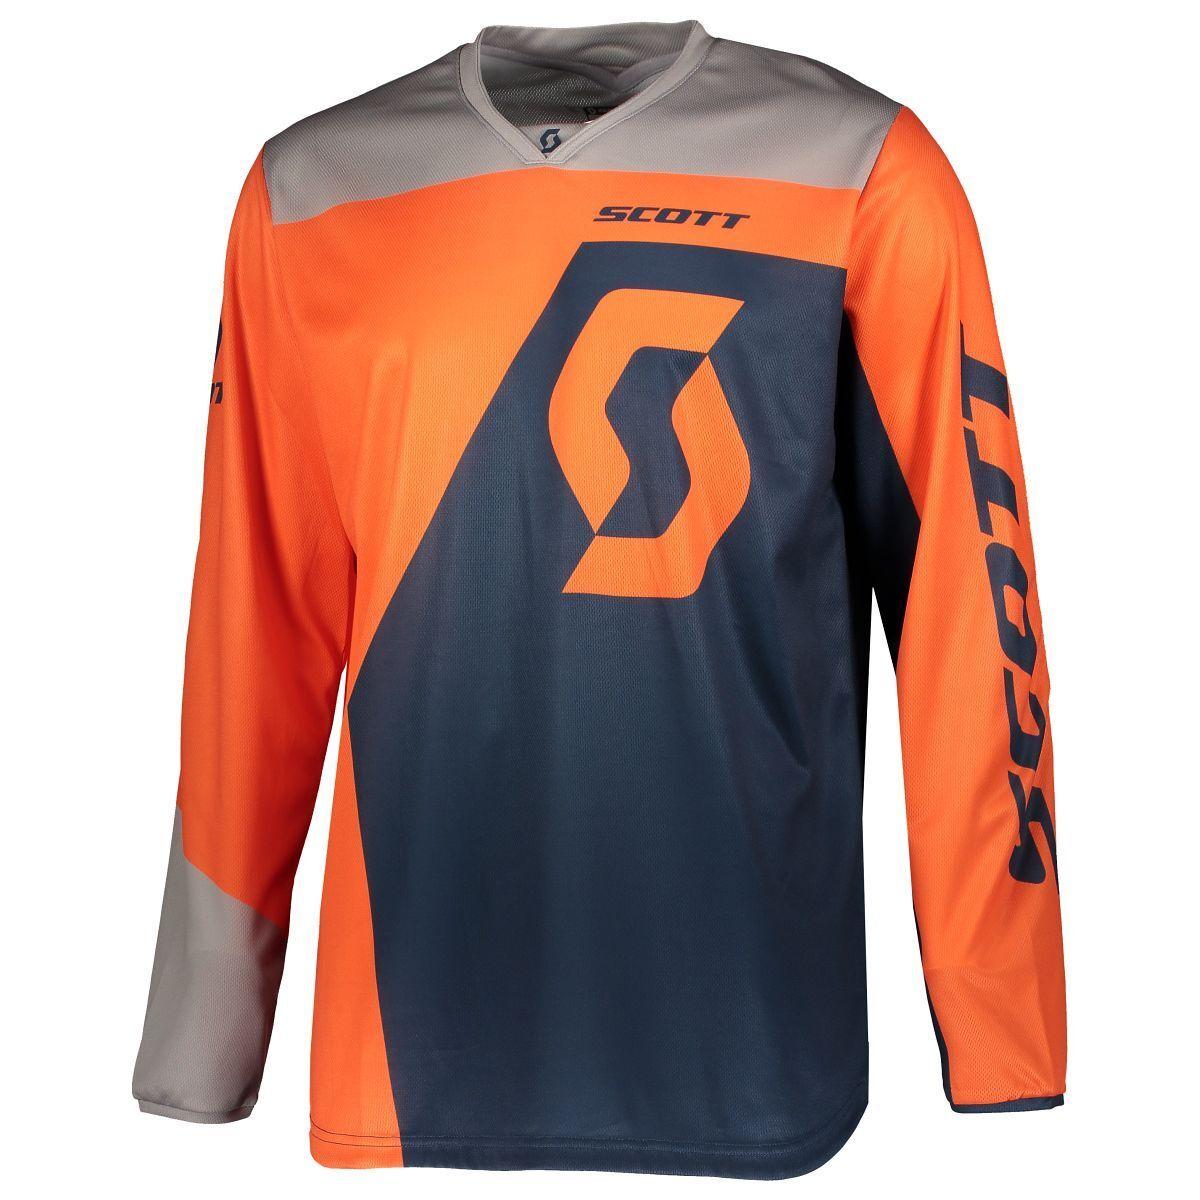 Scott 350 Dirt MX Motocross JerseyDH Bicicletta Maglia ArancioneBlu 2019